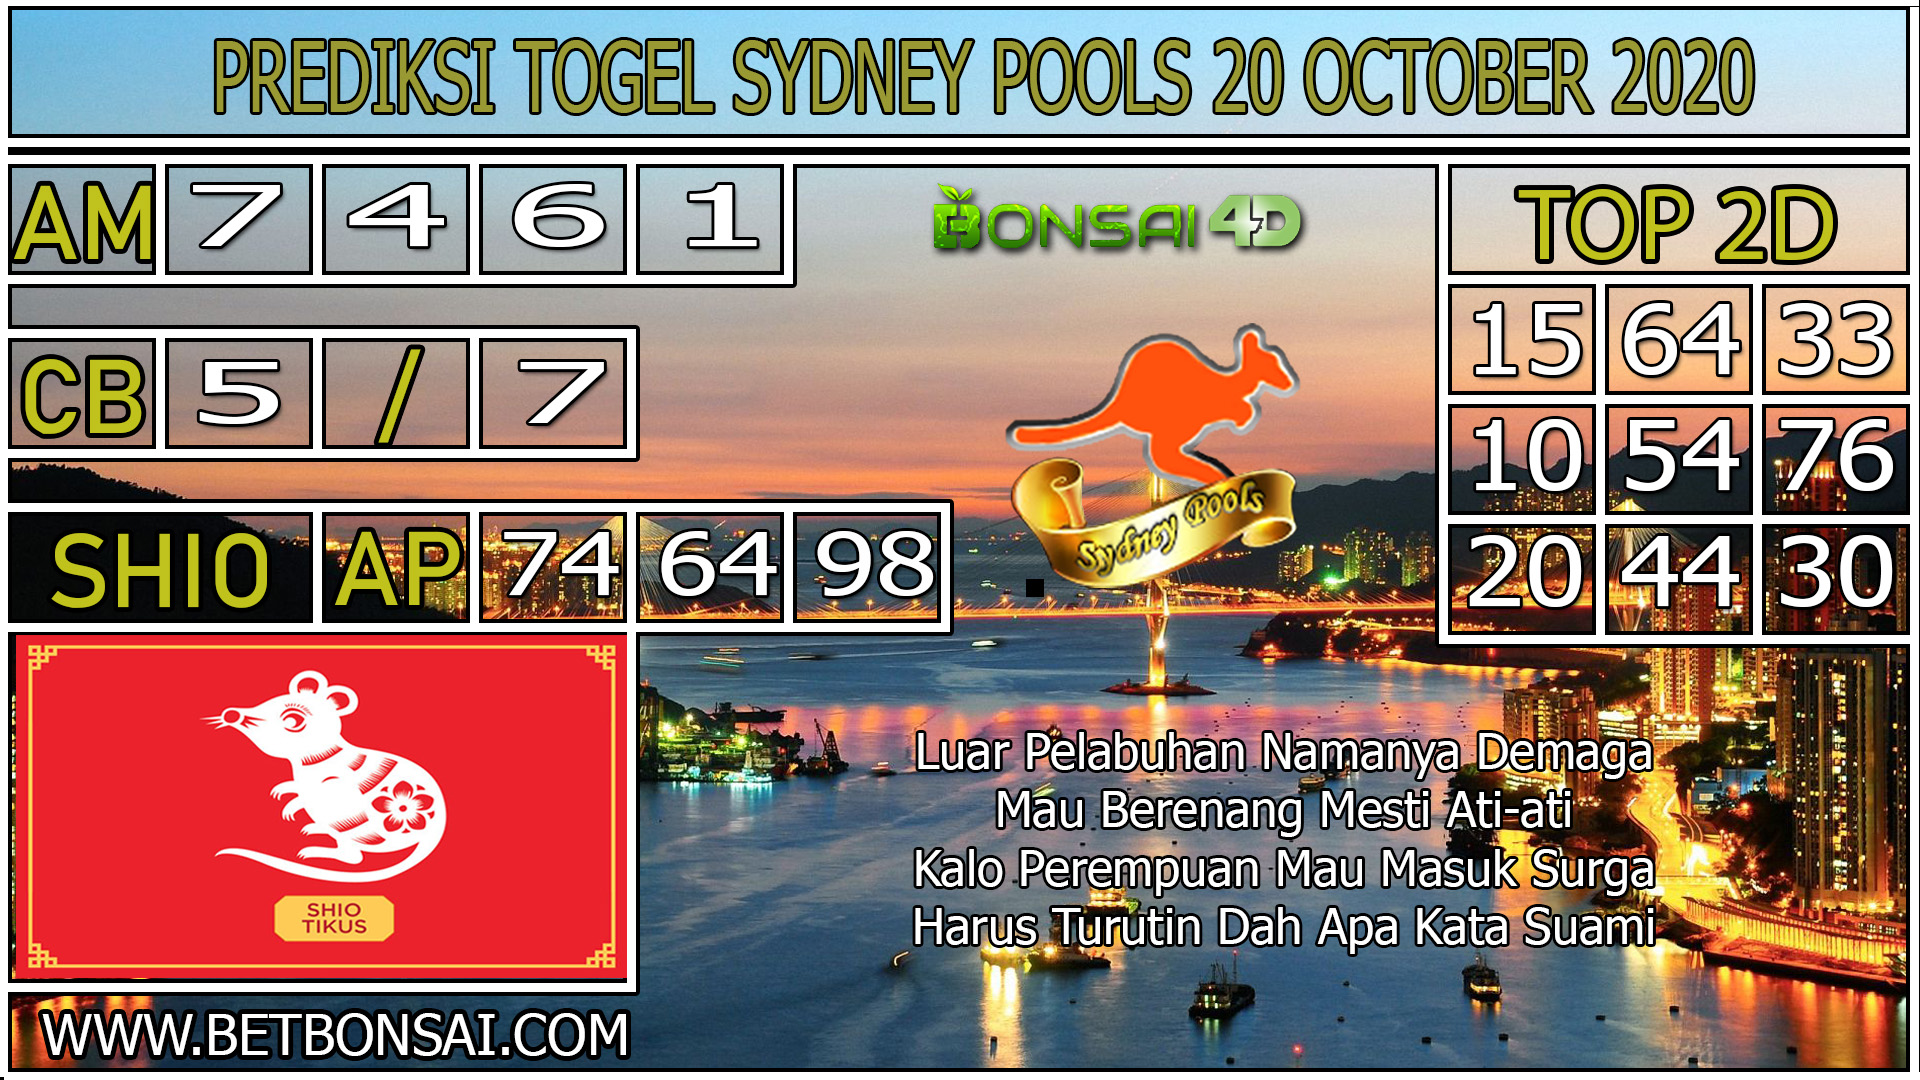 PREDIKSI TOGEL SYDNEY POOLS 20 OCTOBER 2020 - Suhu Bonsai